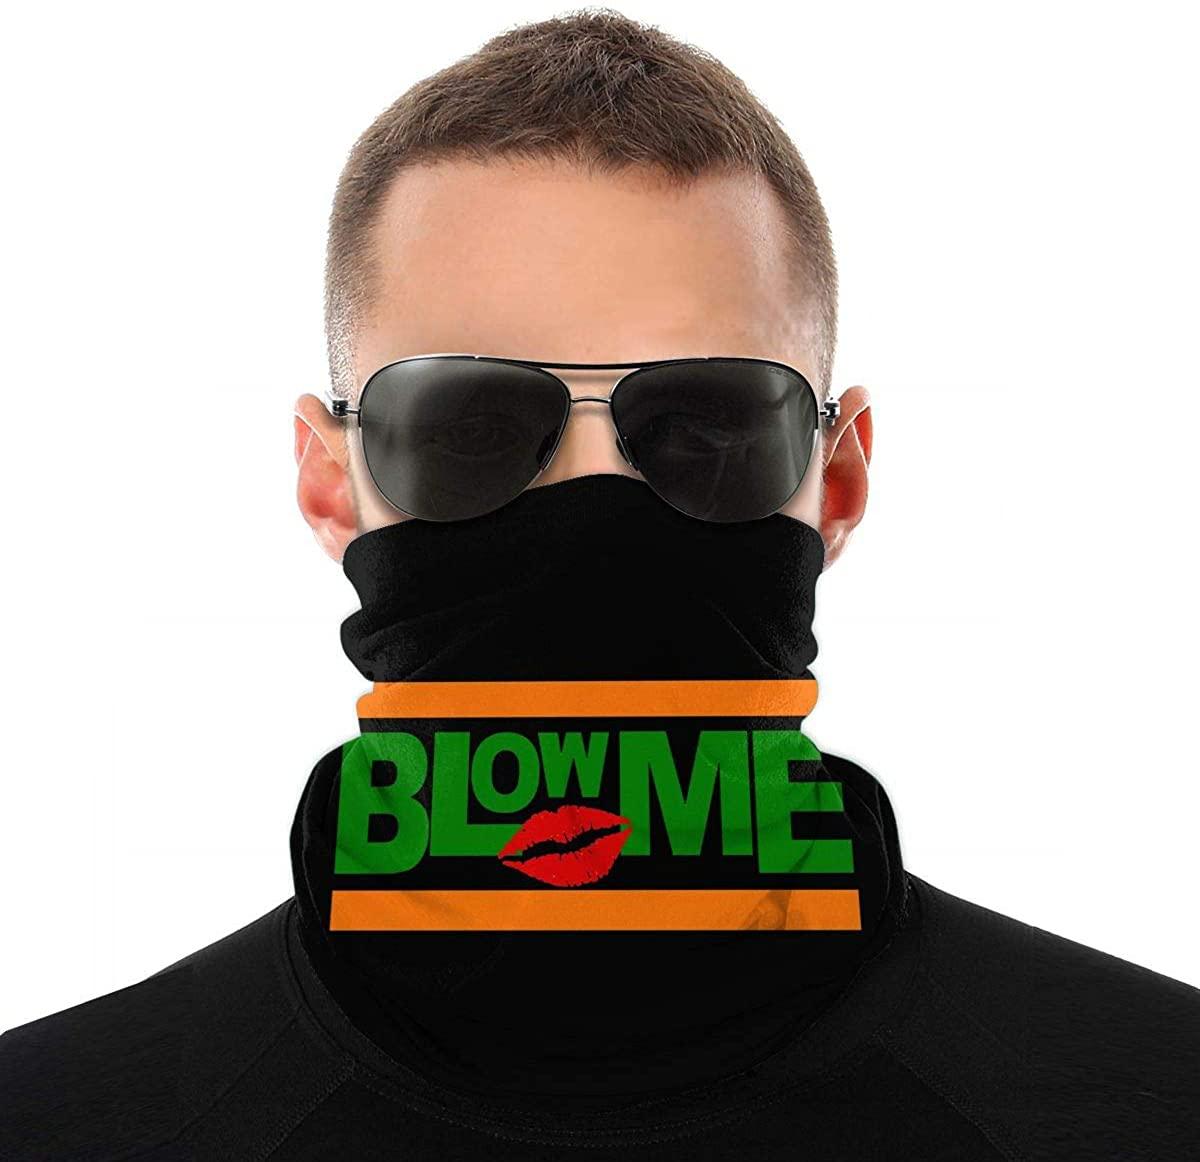 Multifunctional Neck Scarf Bandana Tube Mask For Workout Outdoor Sports Bounce Basketball